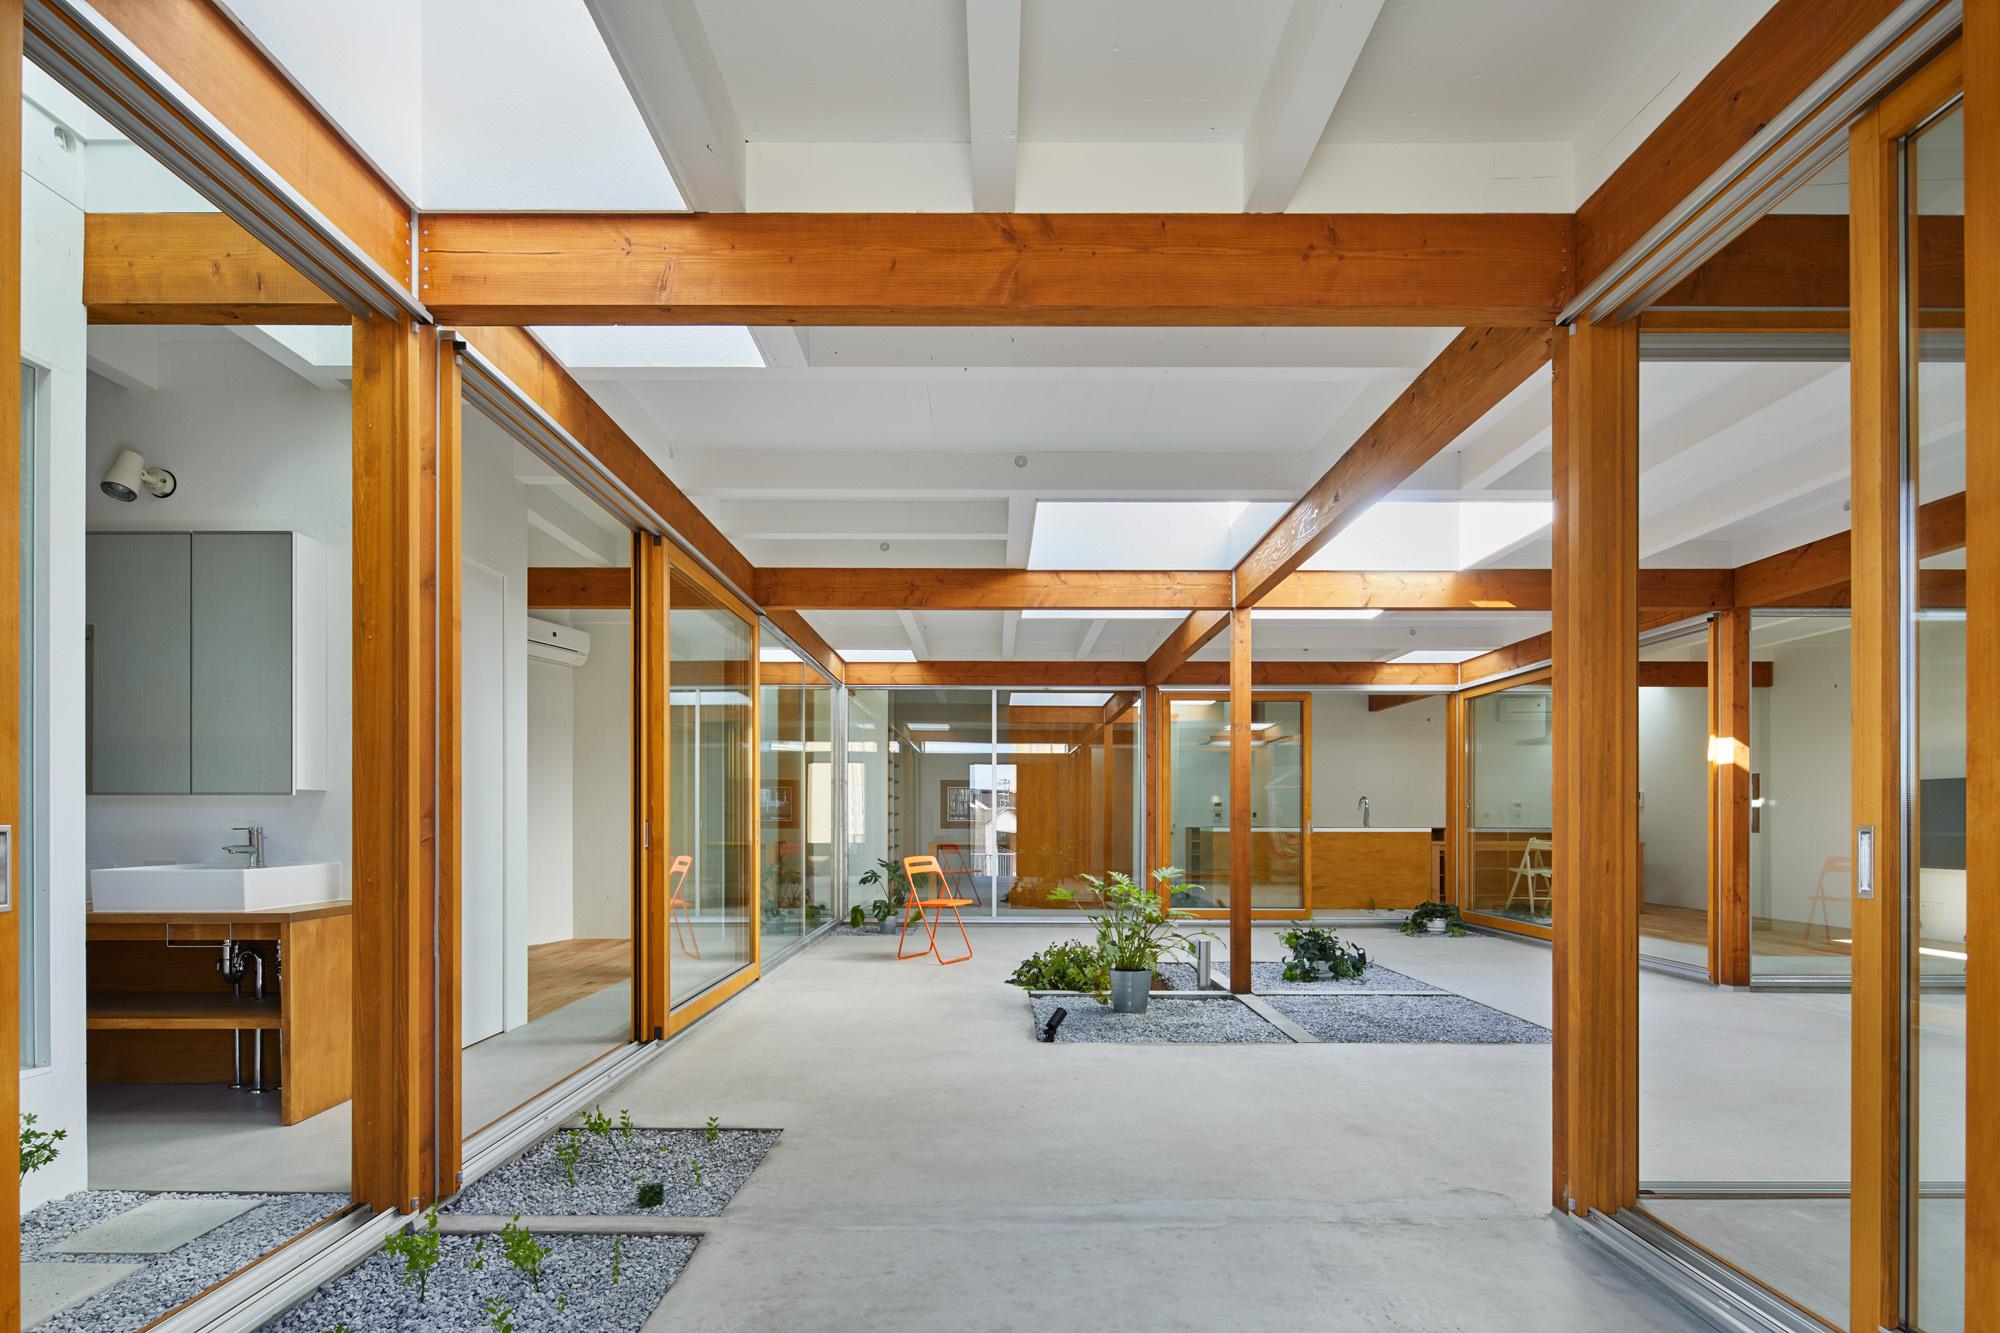 House in Kozukue / Takeshi Hosaka Architects